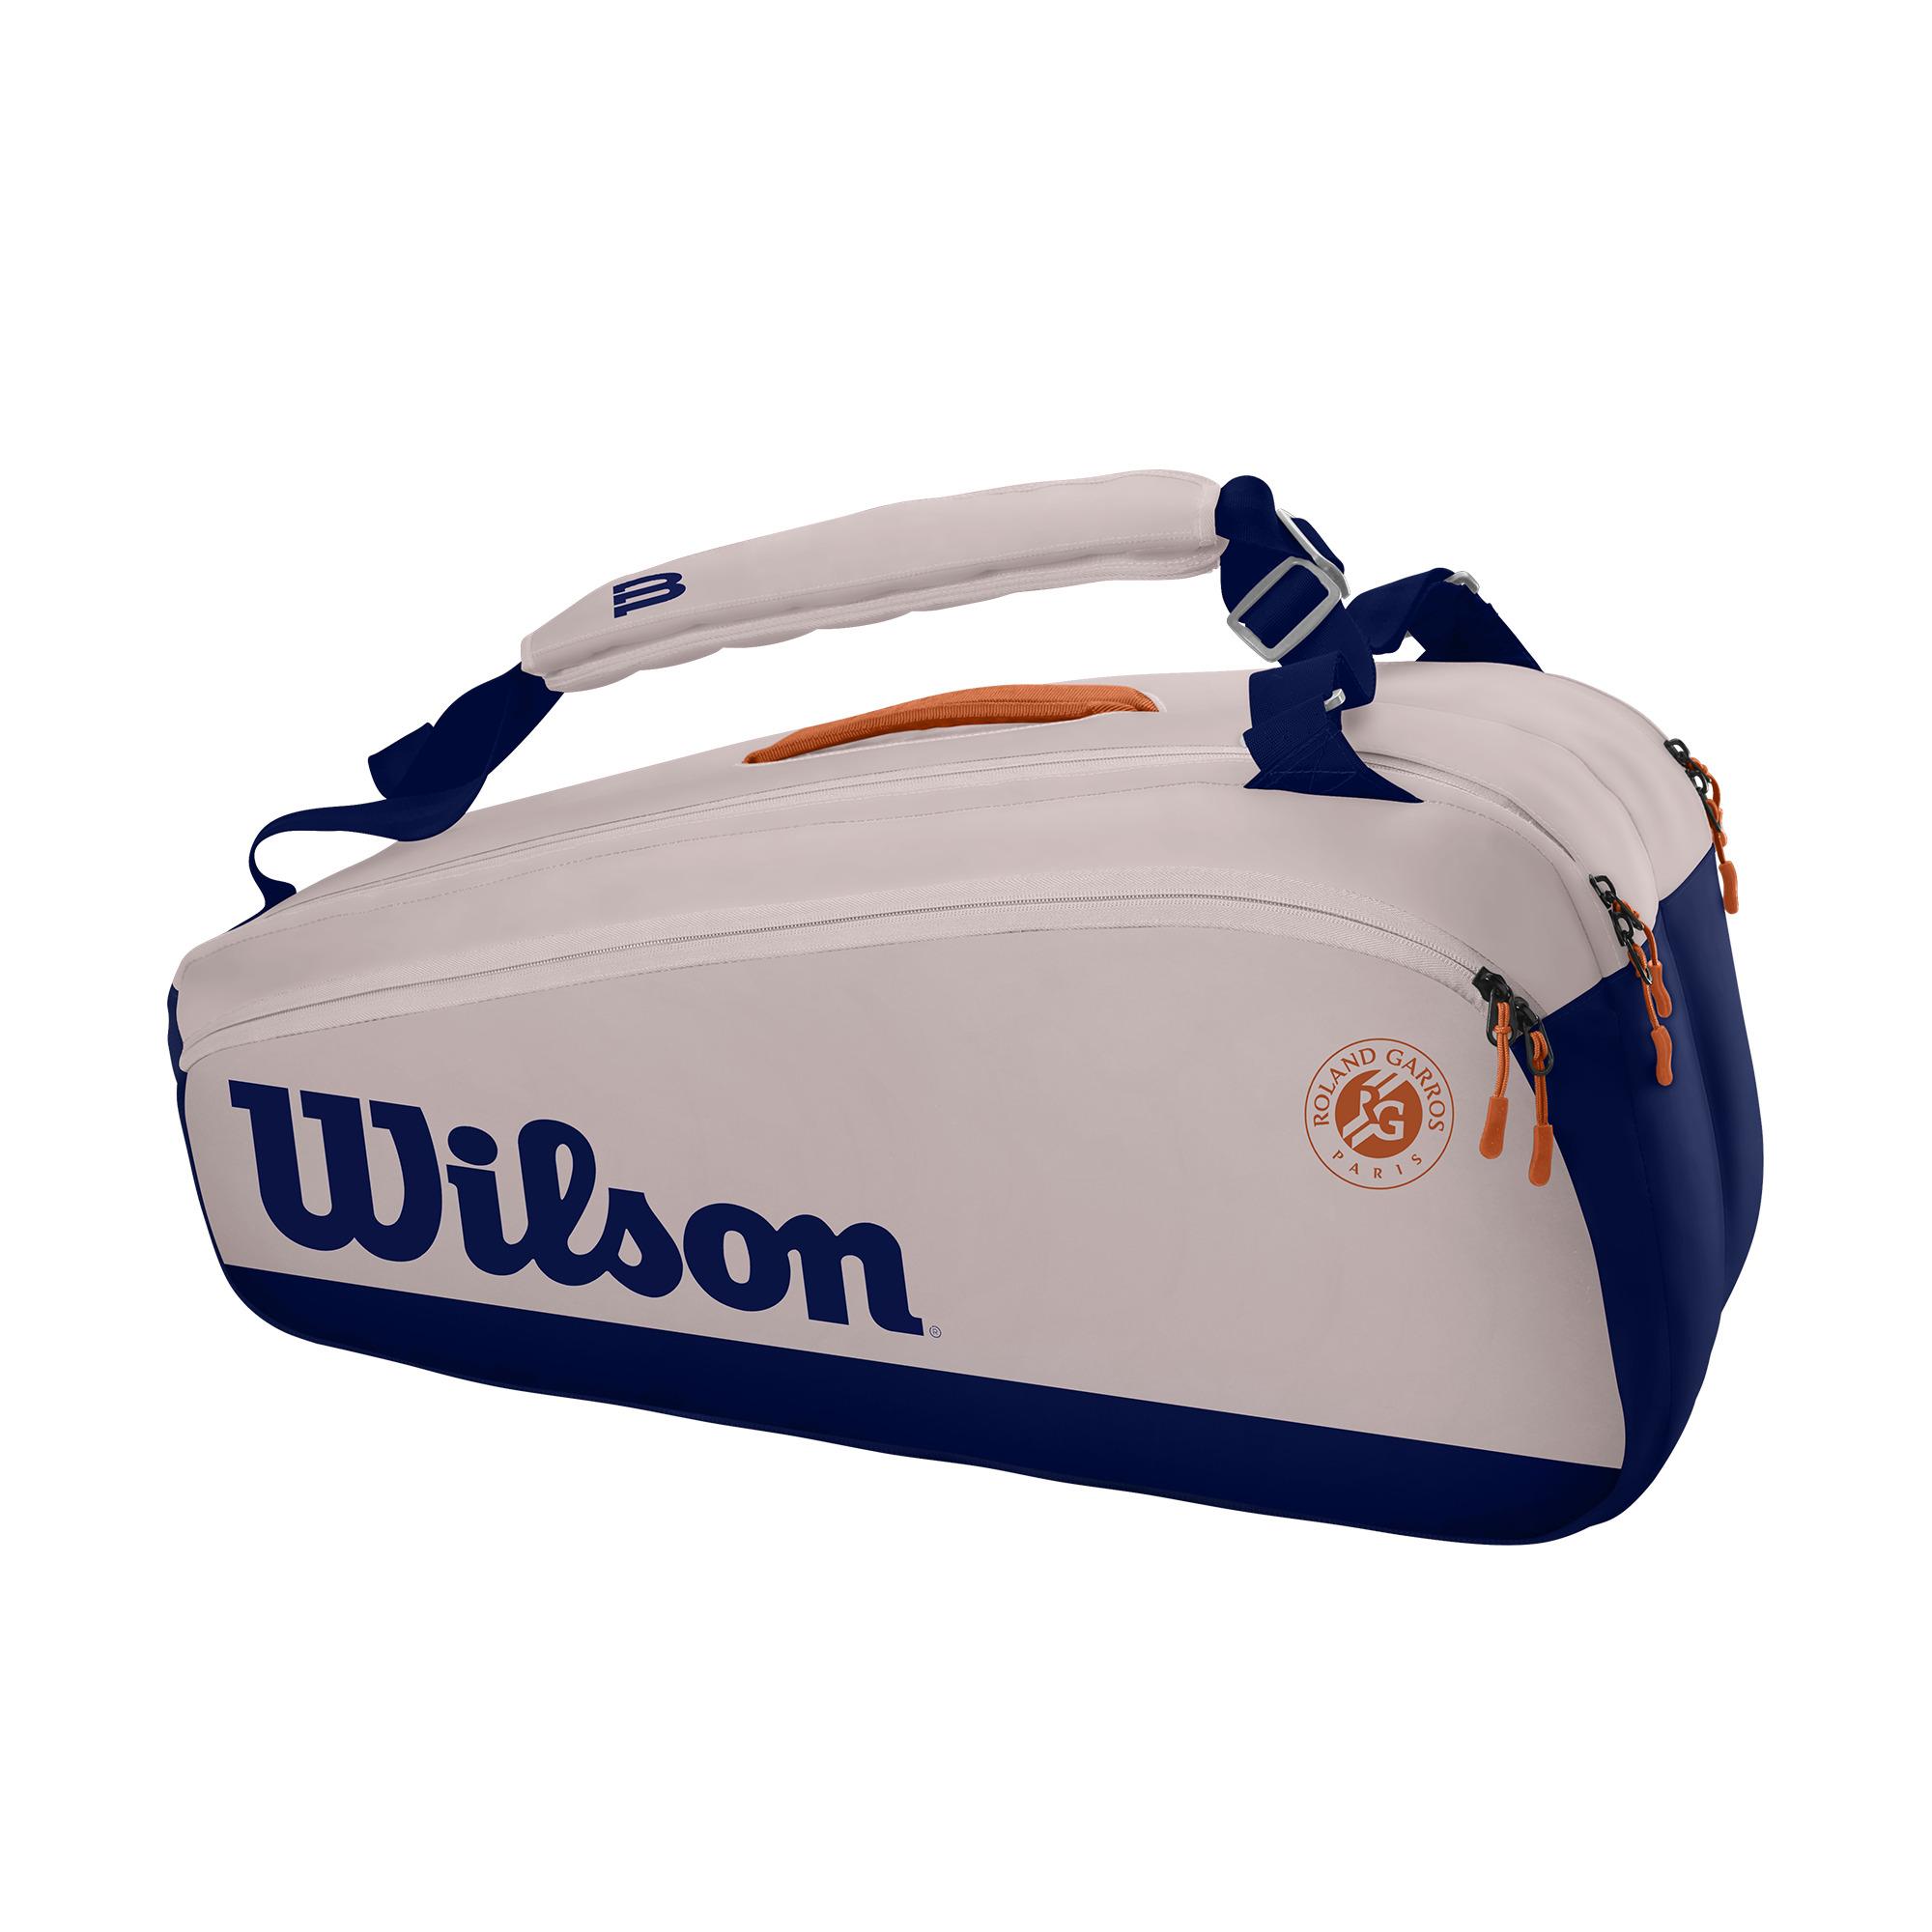 Wilson Roland Garros Tour 9 Pack Tennis Bag – 2021